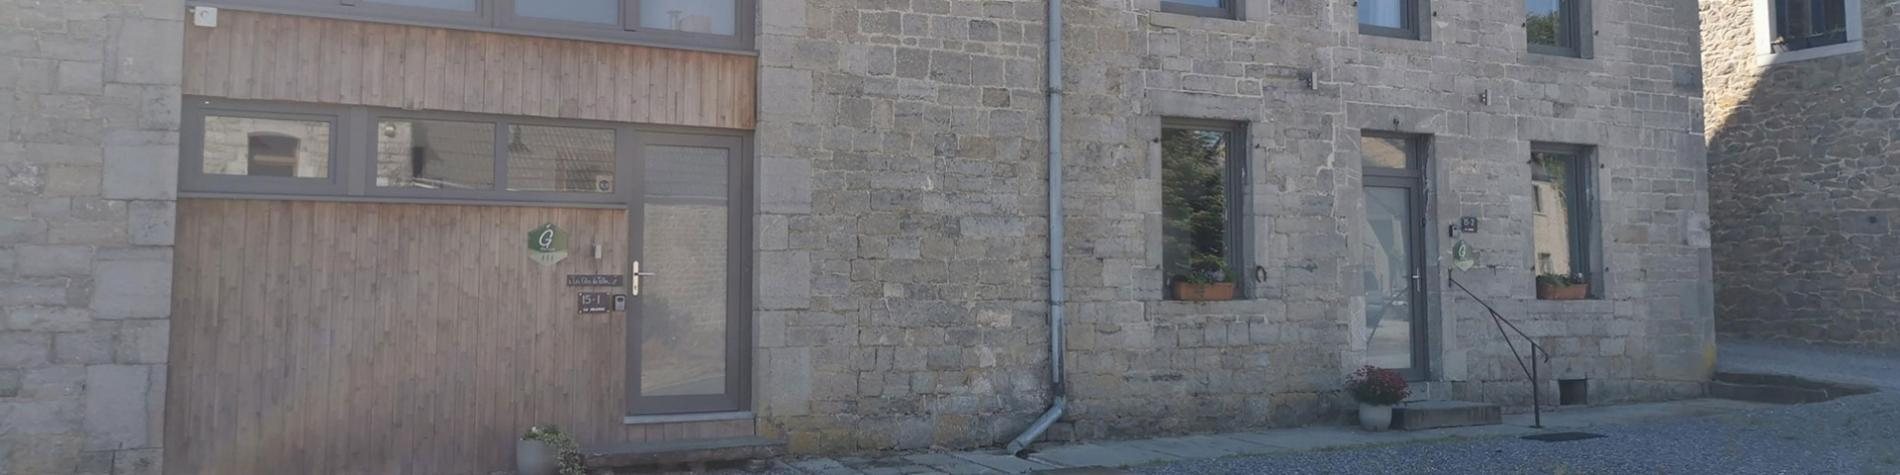 Gîte - Tellin - Le Logis - Chimay